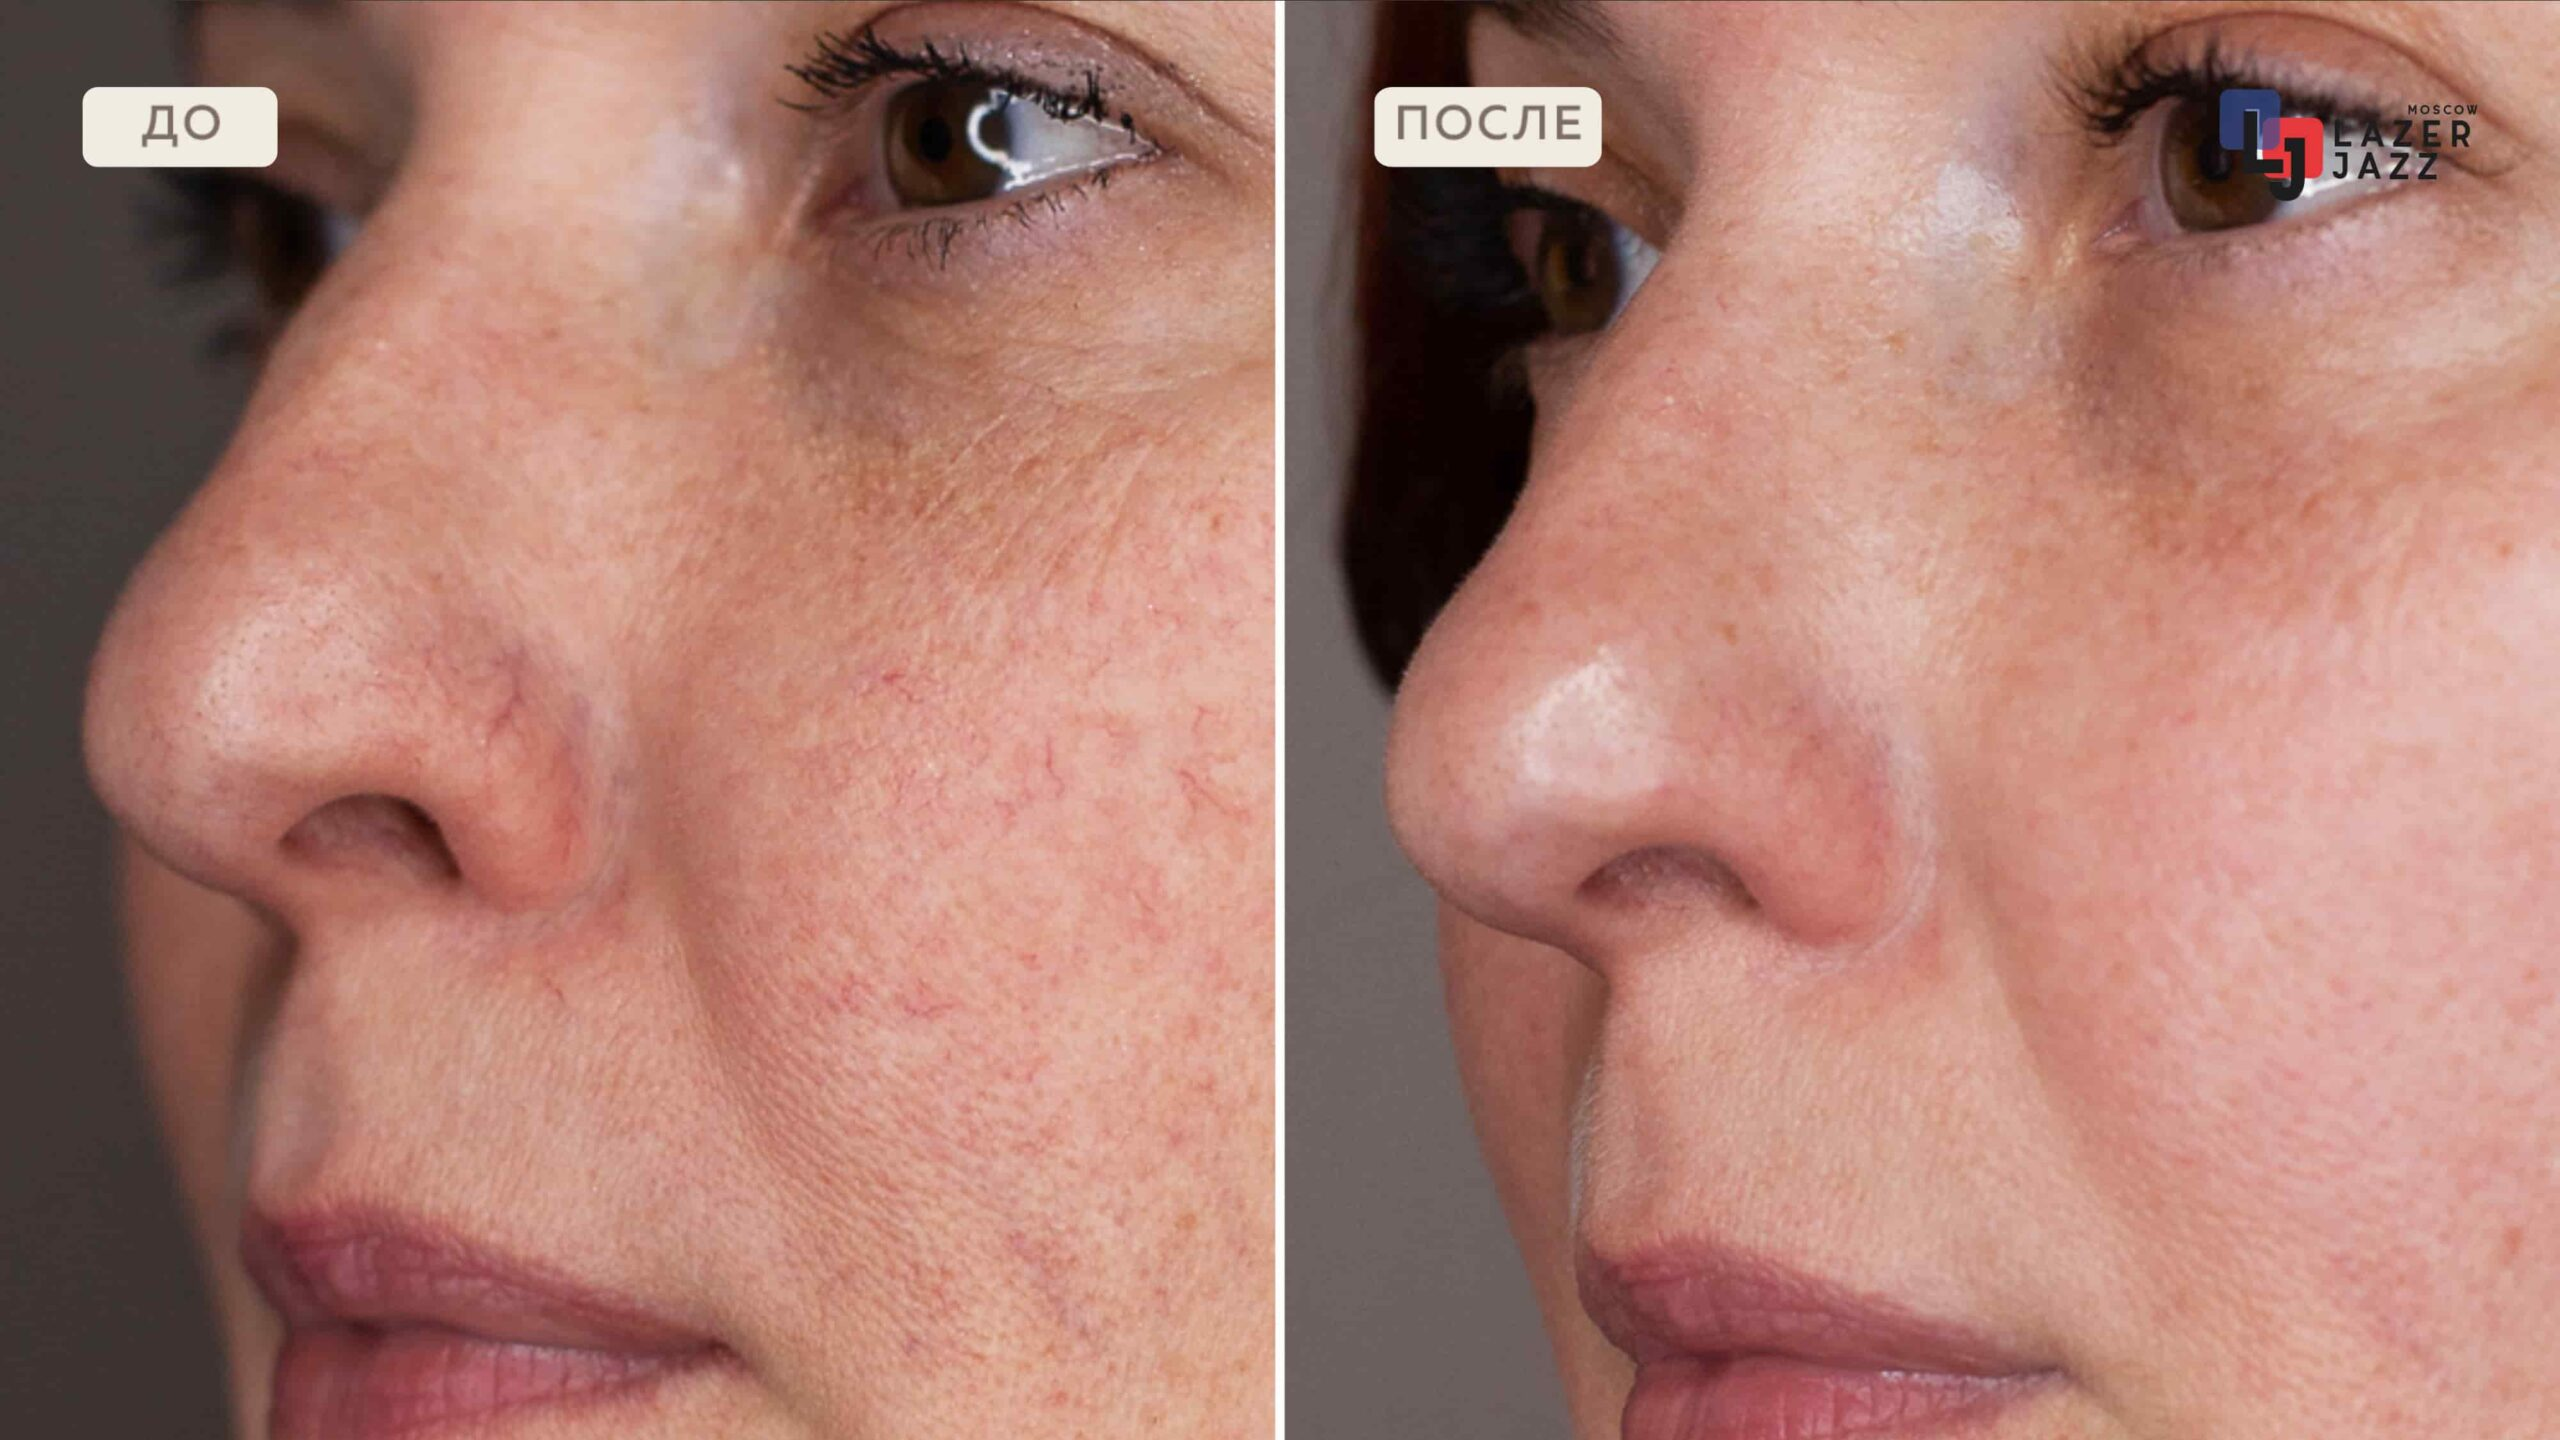 Lechenie-rozacea-pacientka-40-let-1-scaled